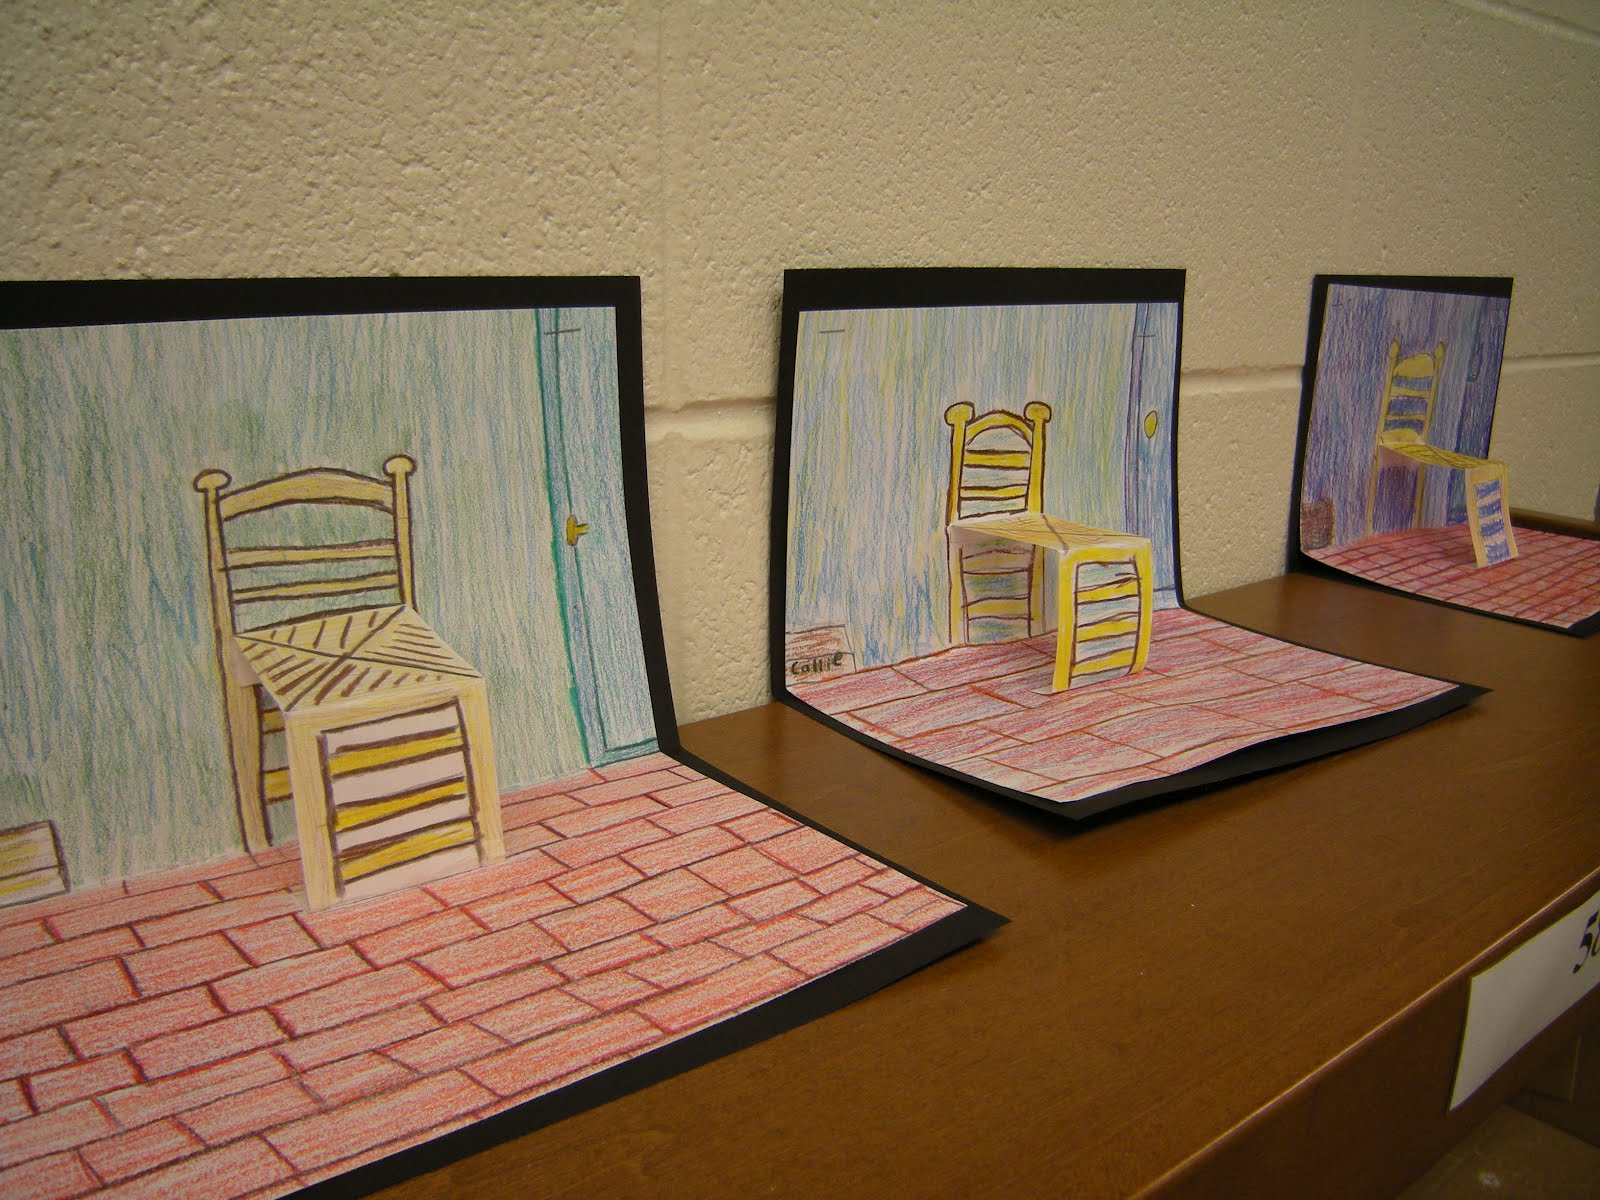 pop up chair gaming chairs artolazzi van gogh